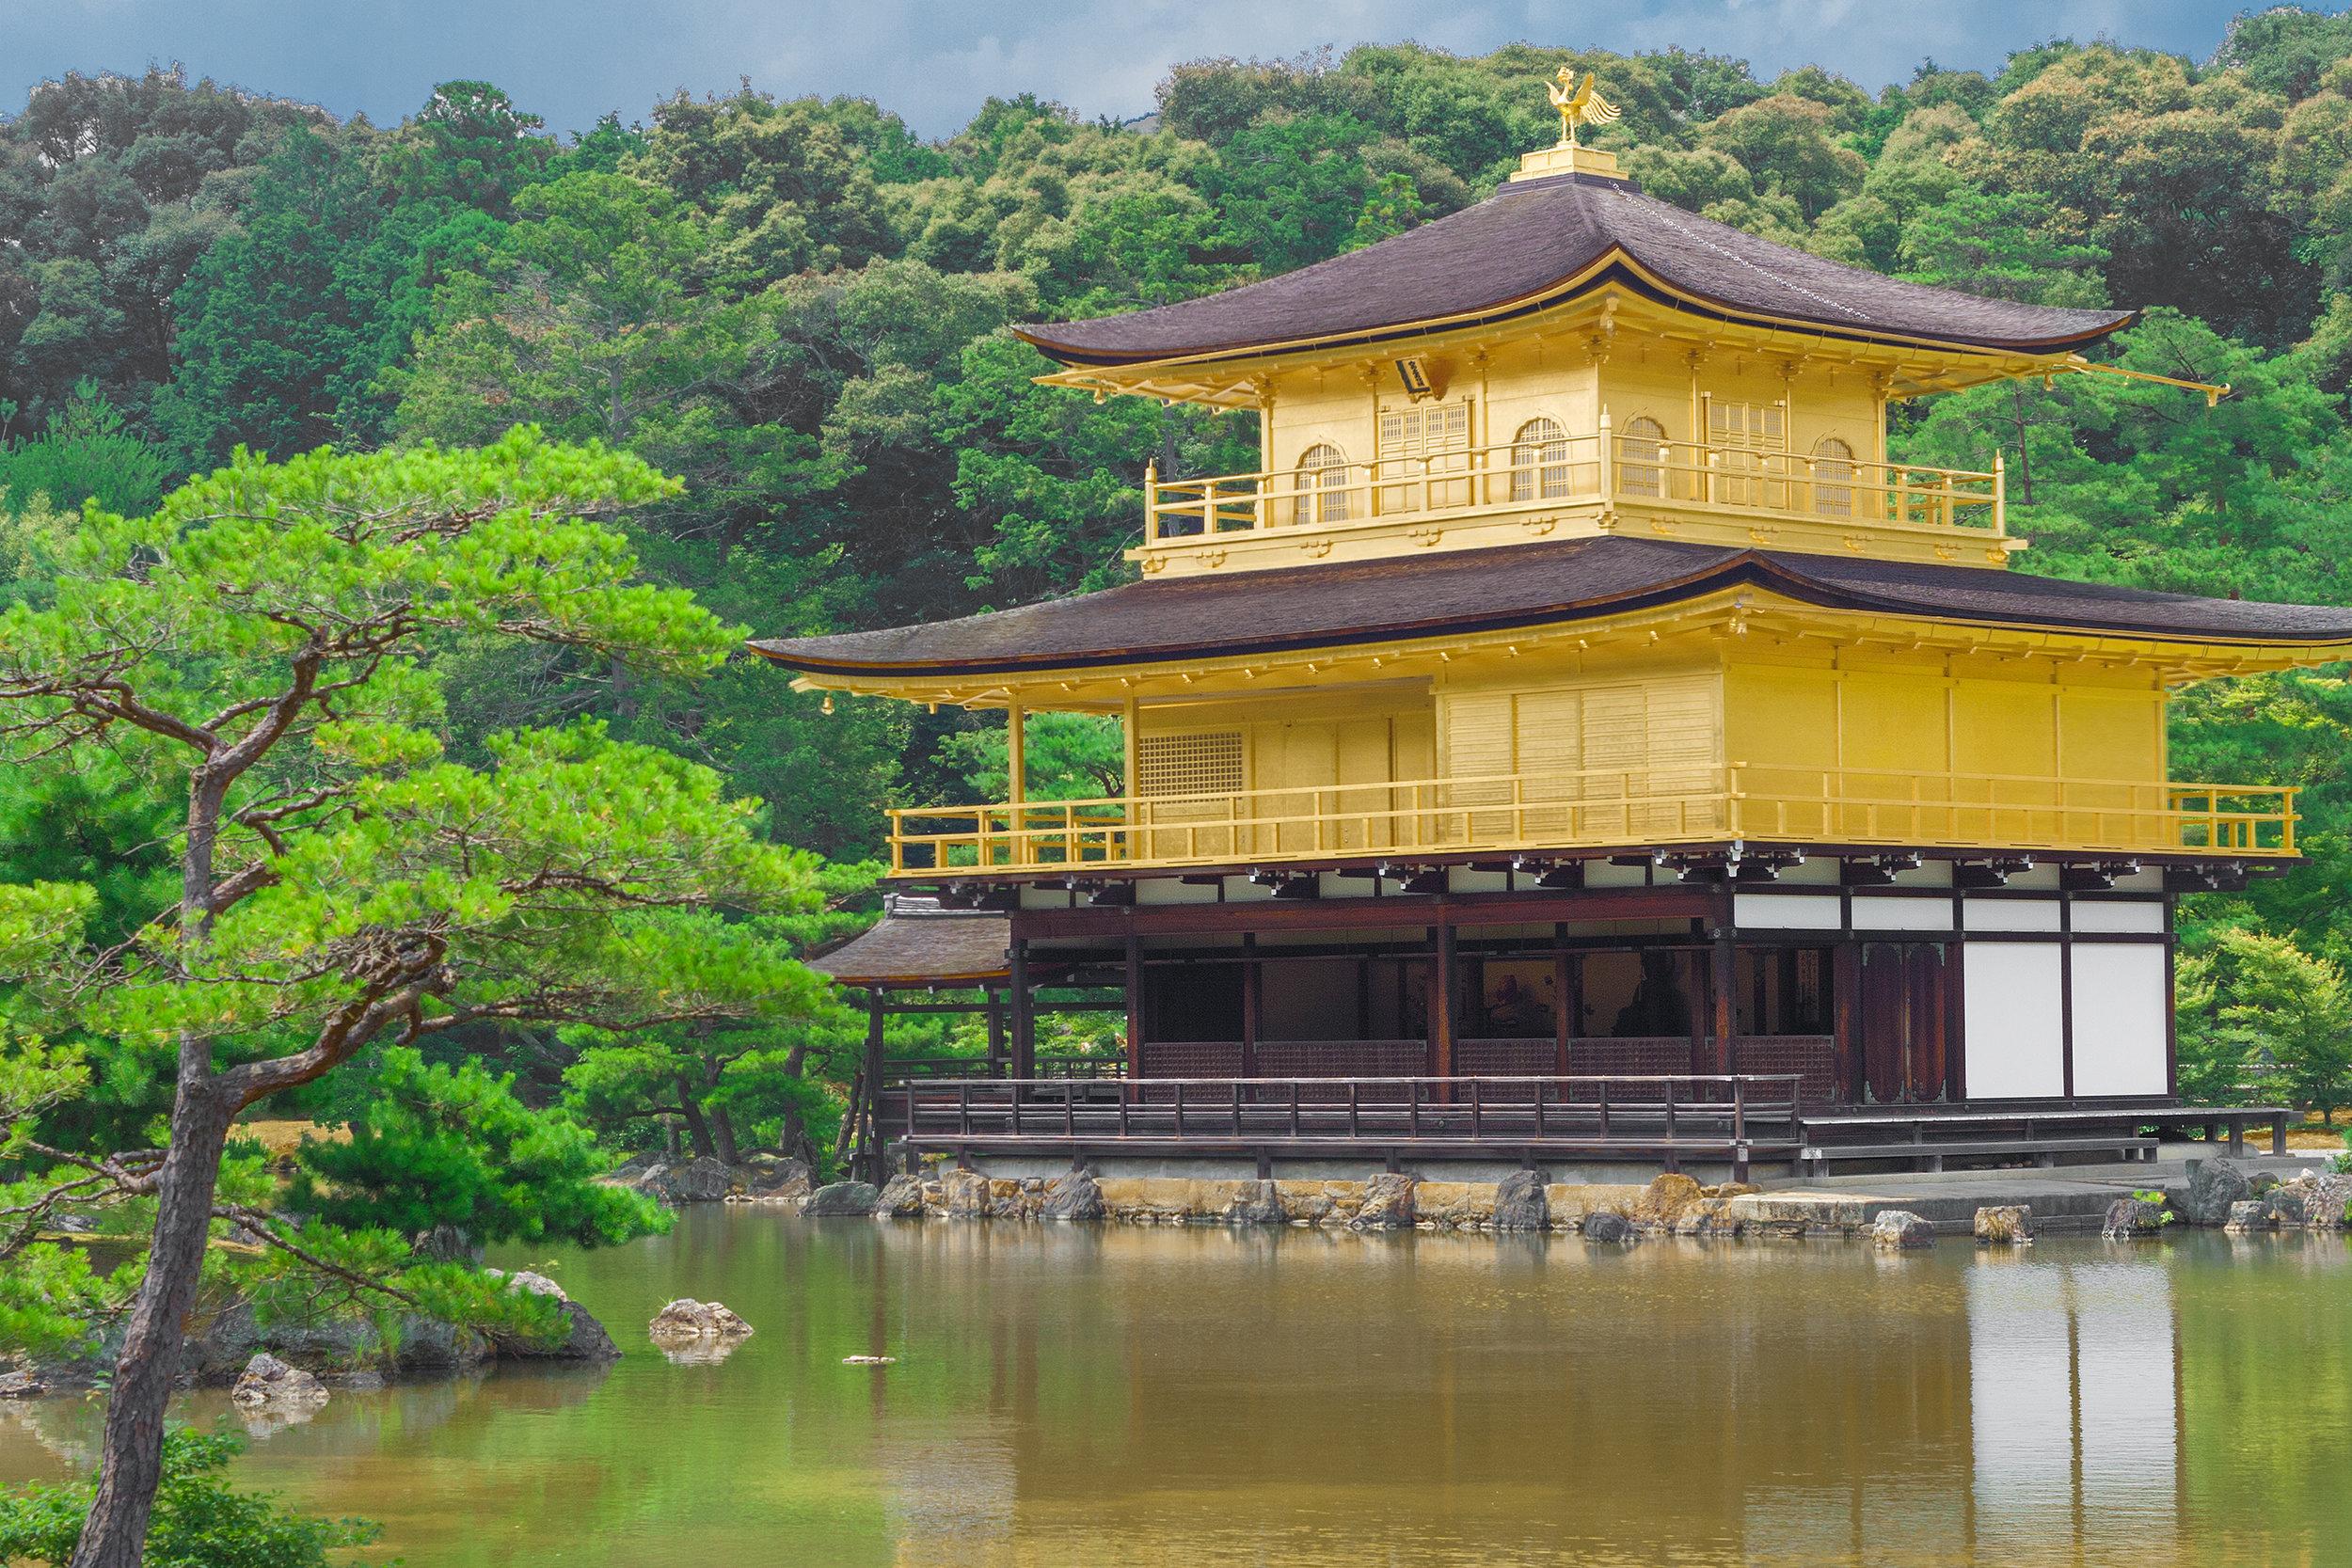 The Golden Pavilion II, Kinkaku-ji, Kyoto, Color Photograph